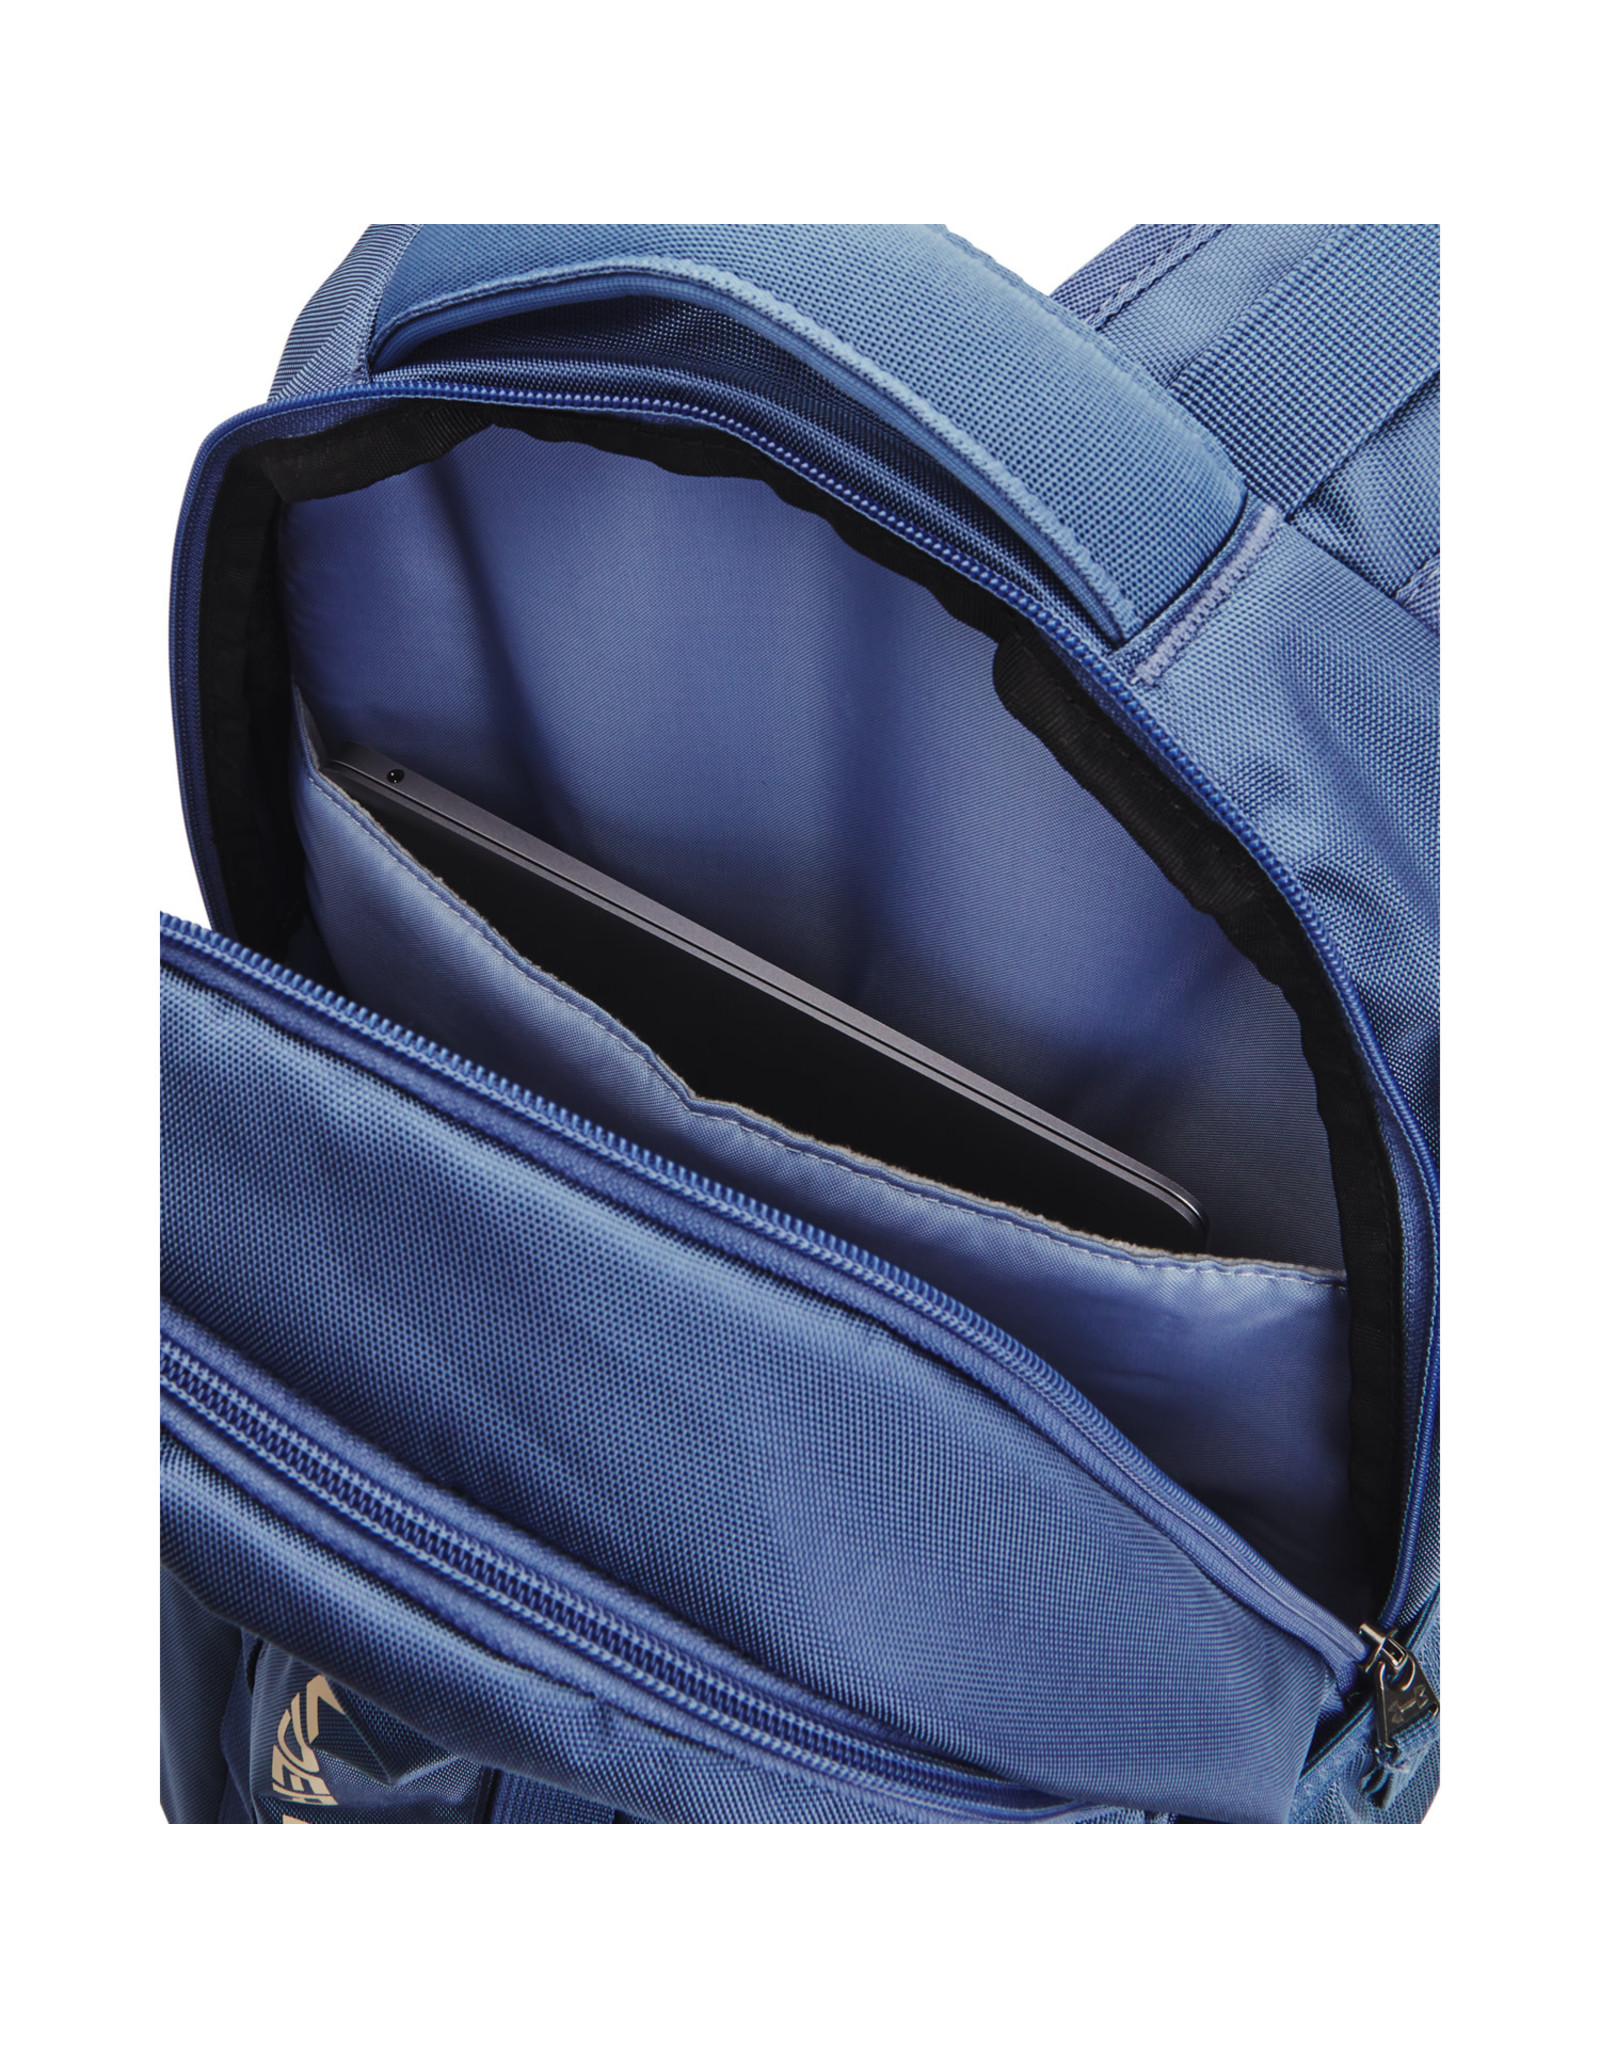 Under Armour UA Hustle 5.0 Backpack-BLU,OSFA